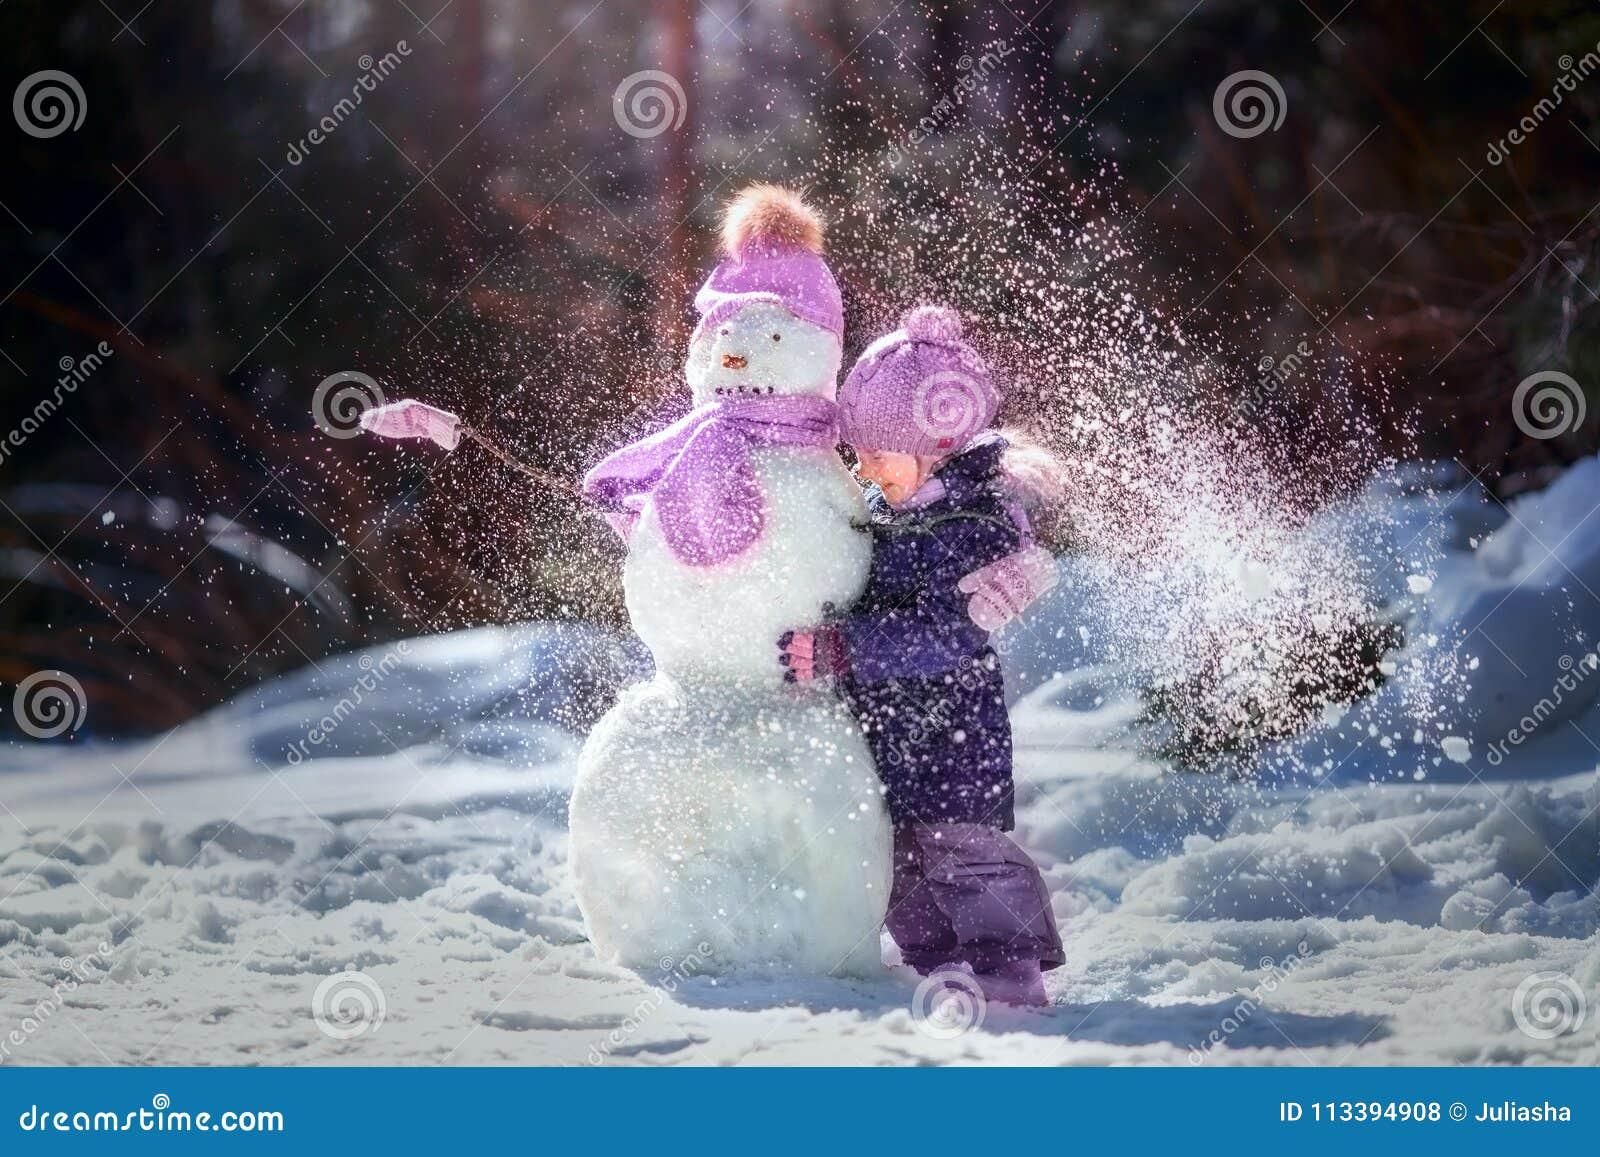 Little girl winter fun